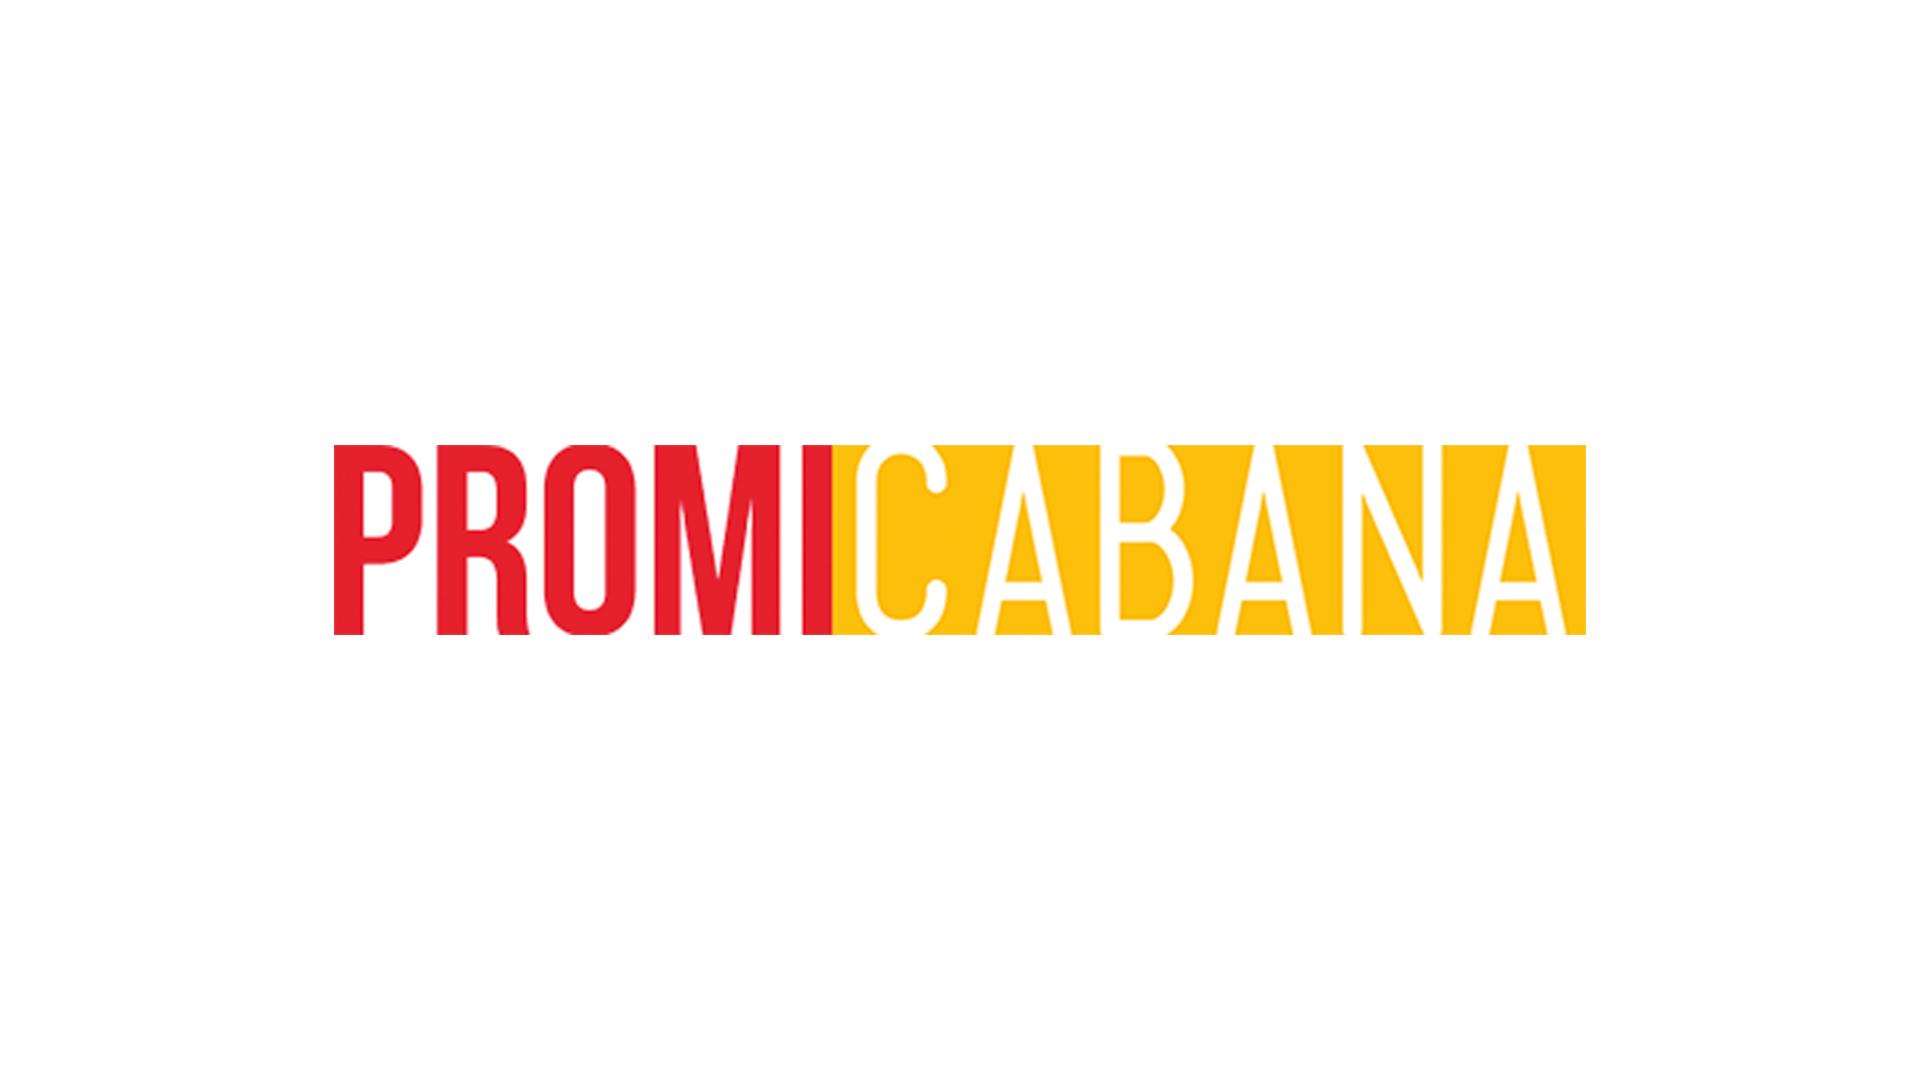 Charlie-Sheen-Interview-Soehne